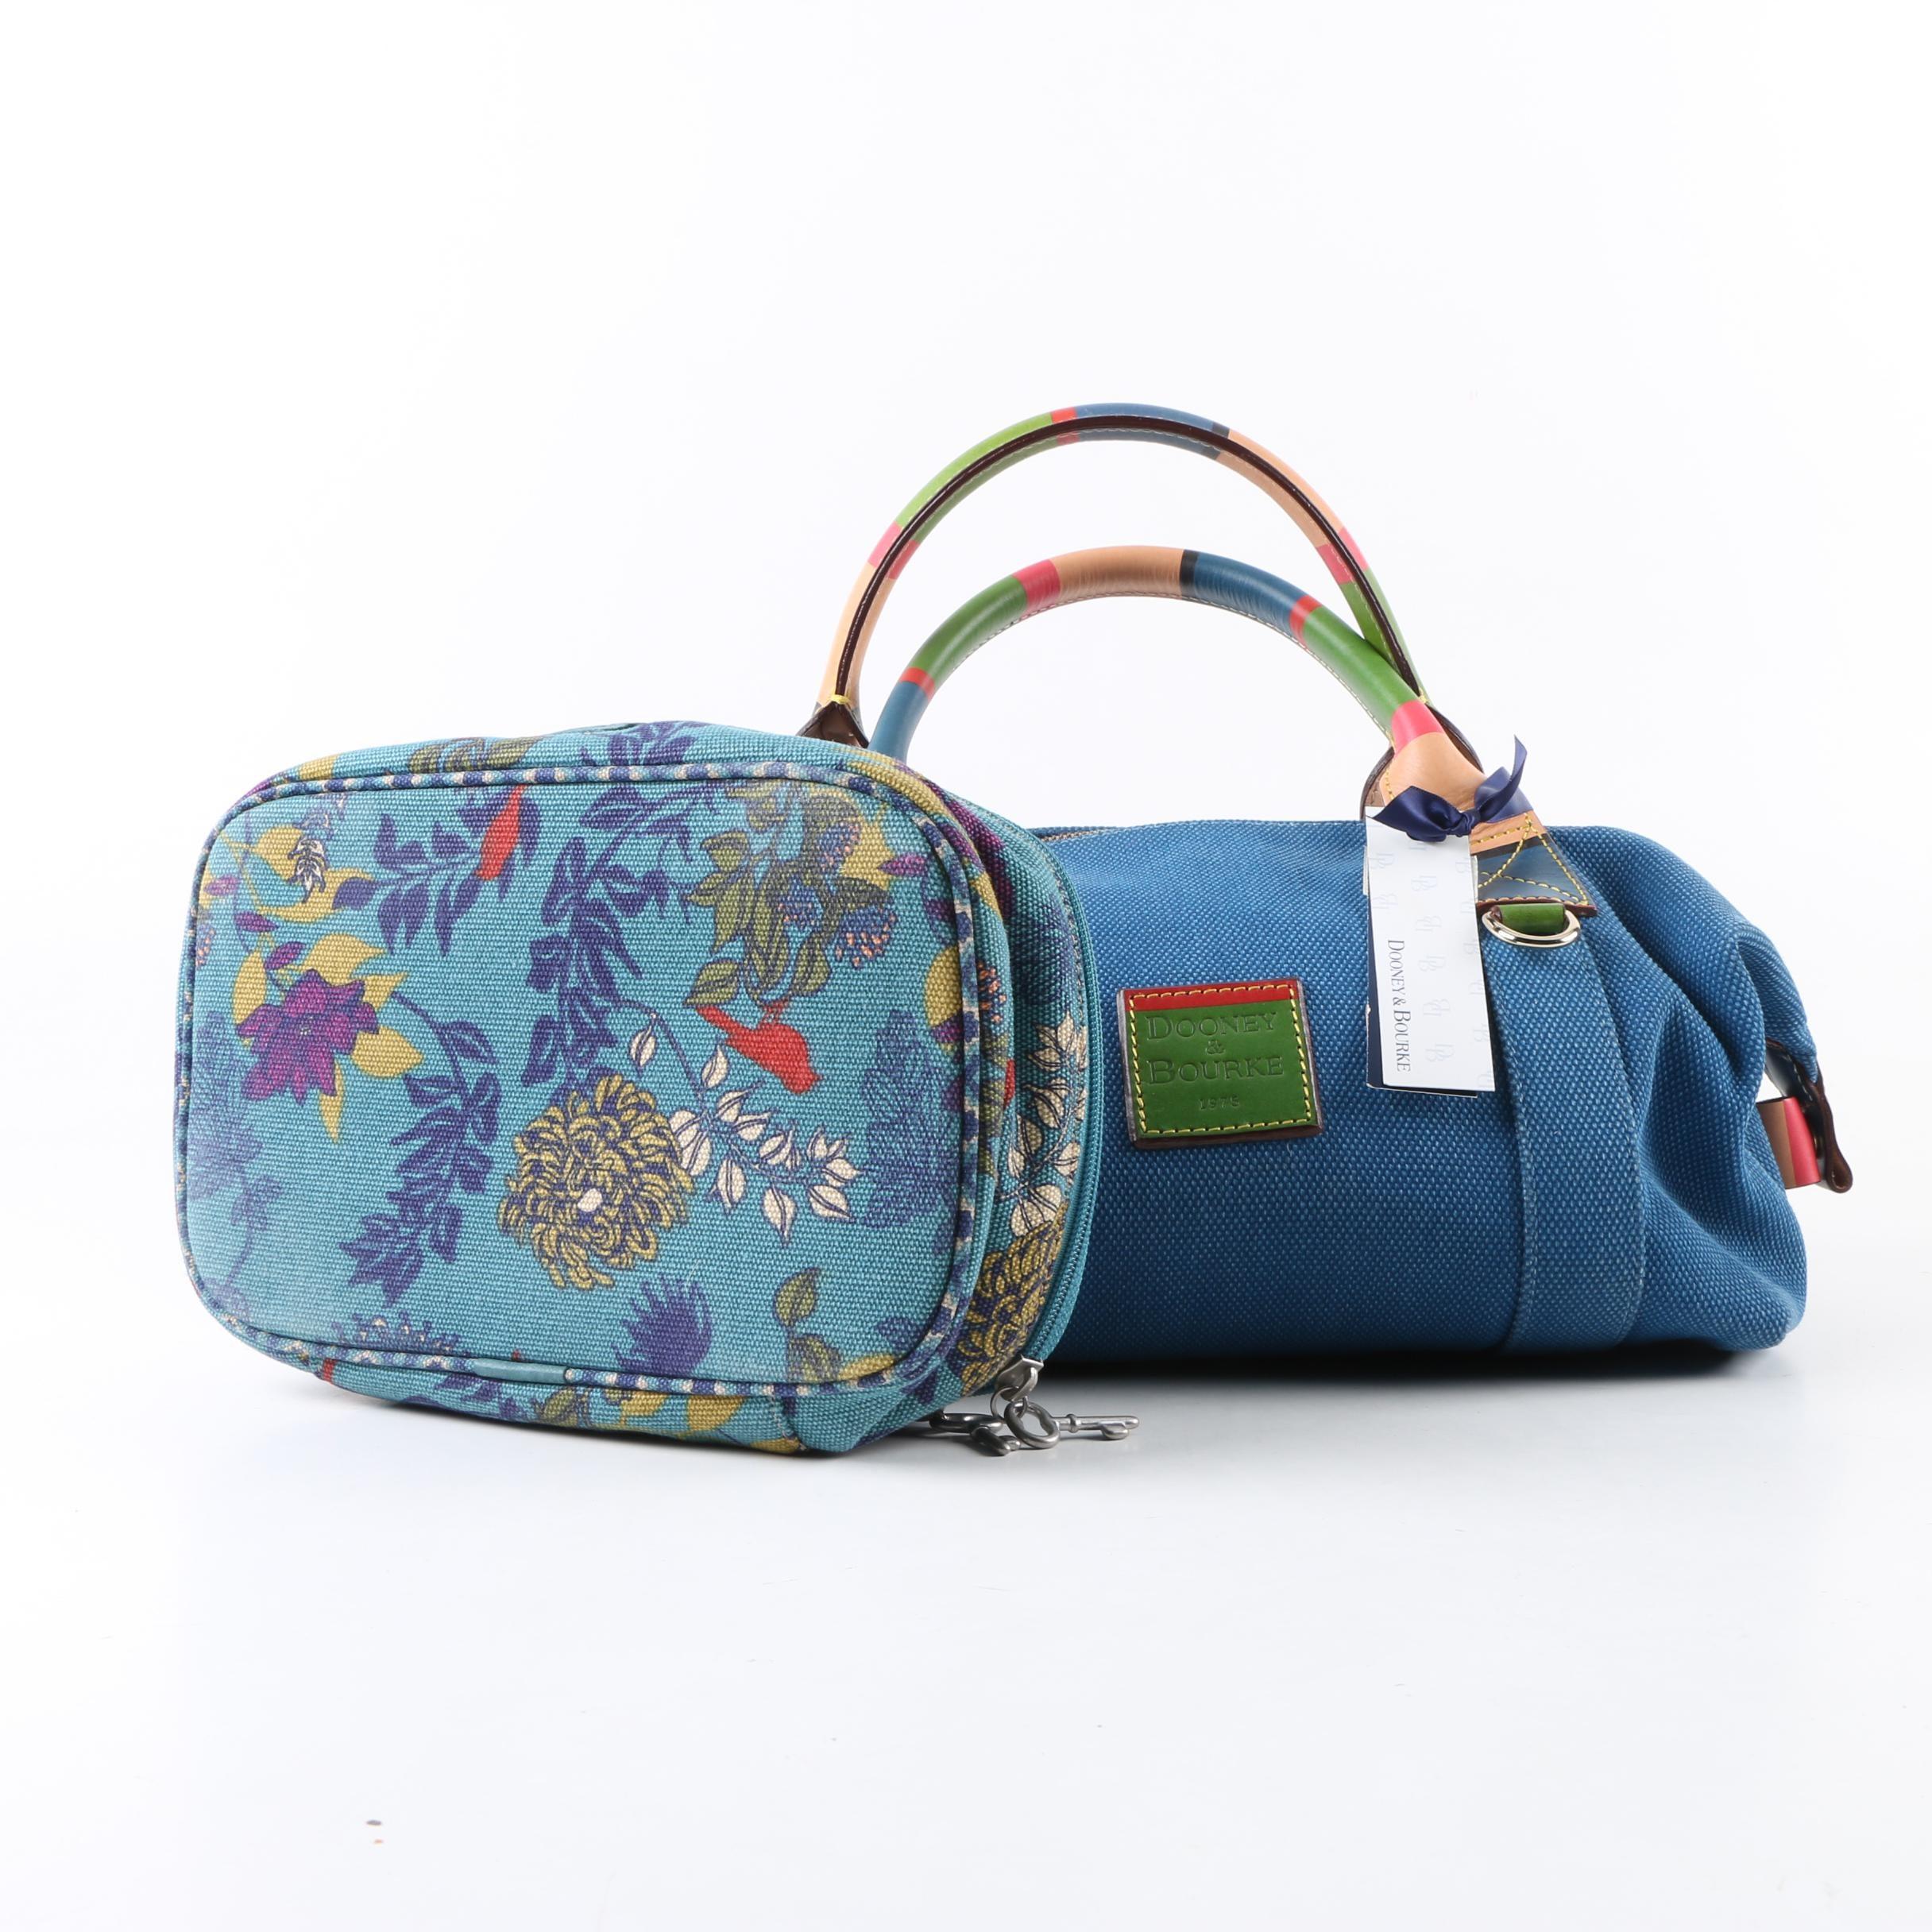 Dooney & Bourke Canvas Handbag with Fossil Cosmetic Bag